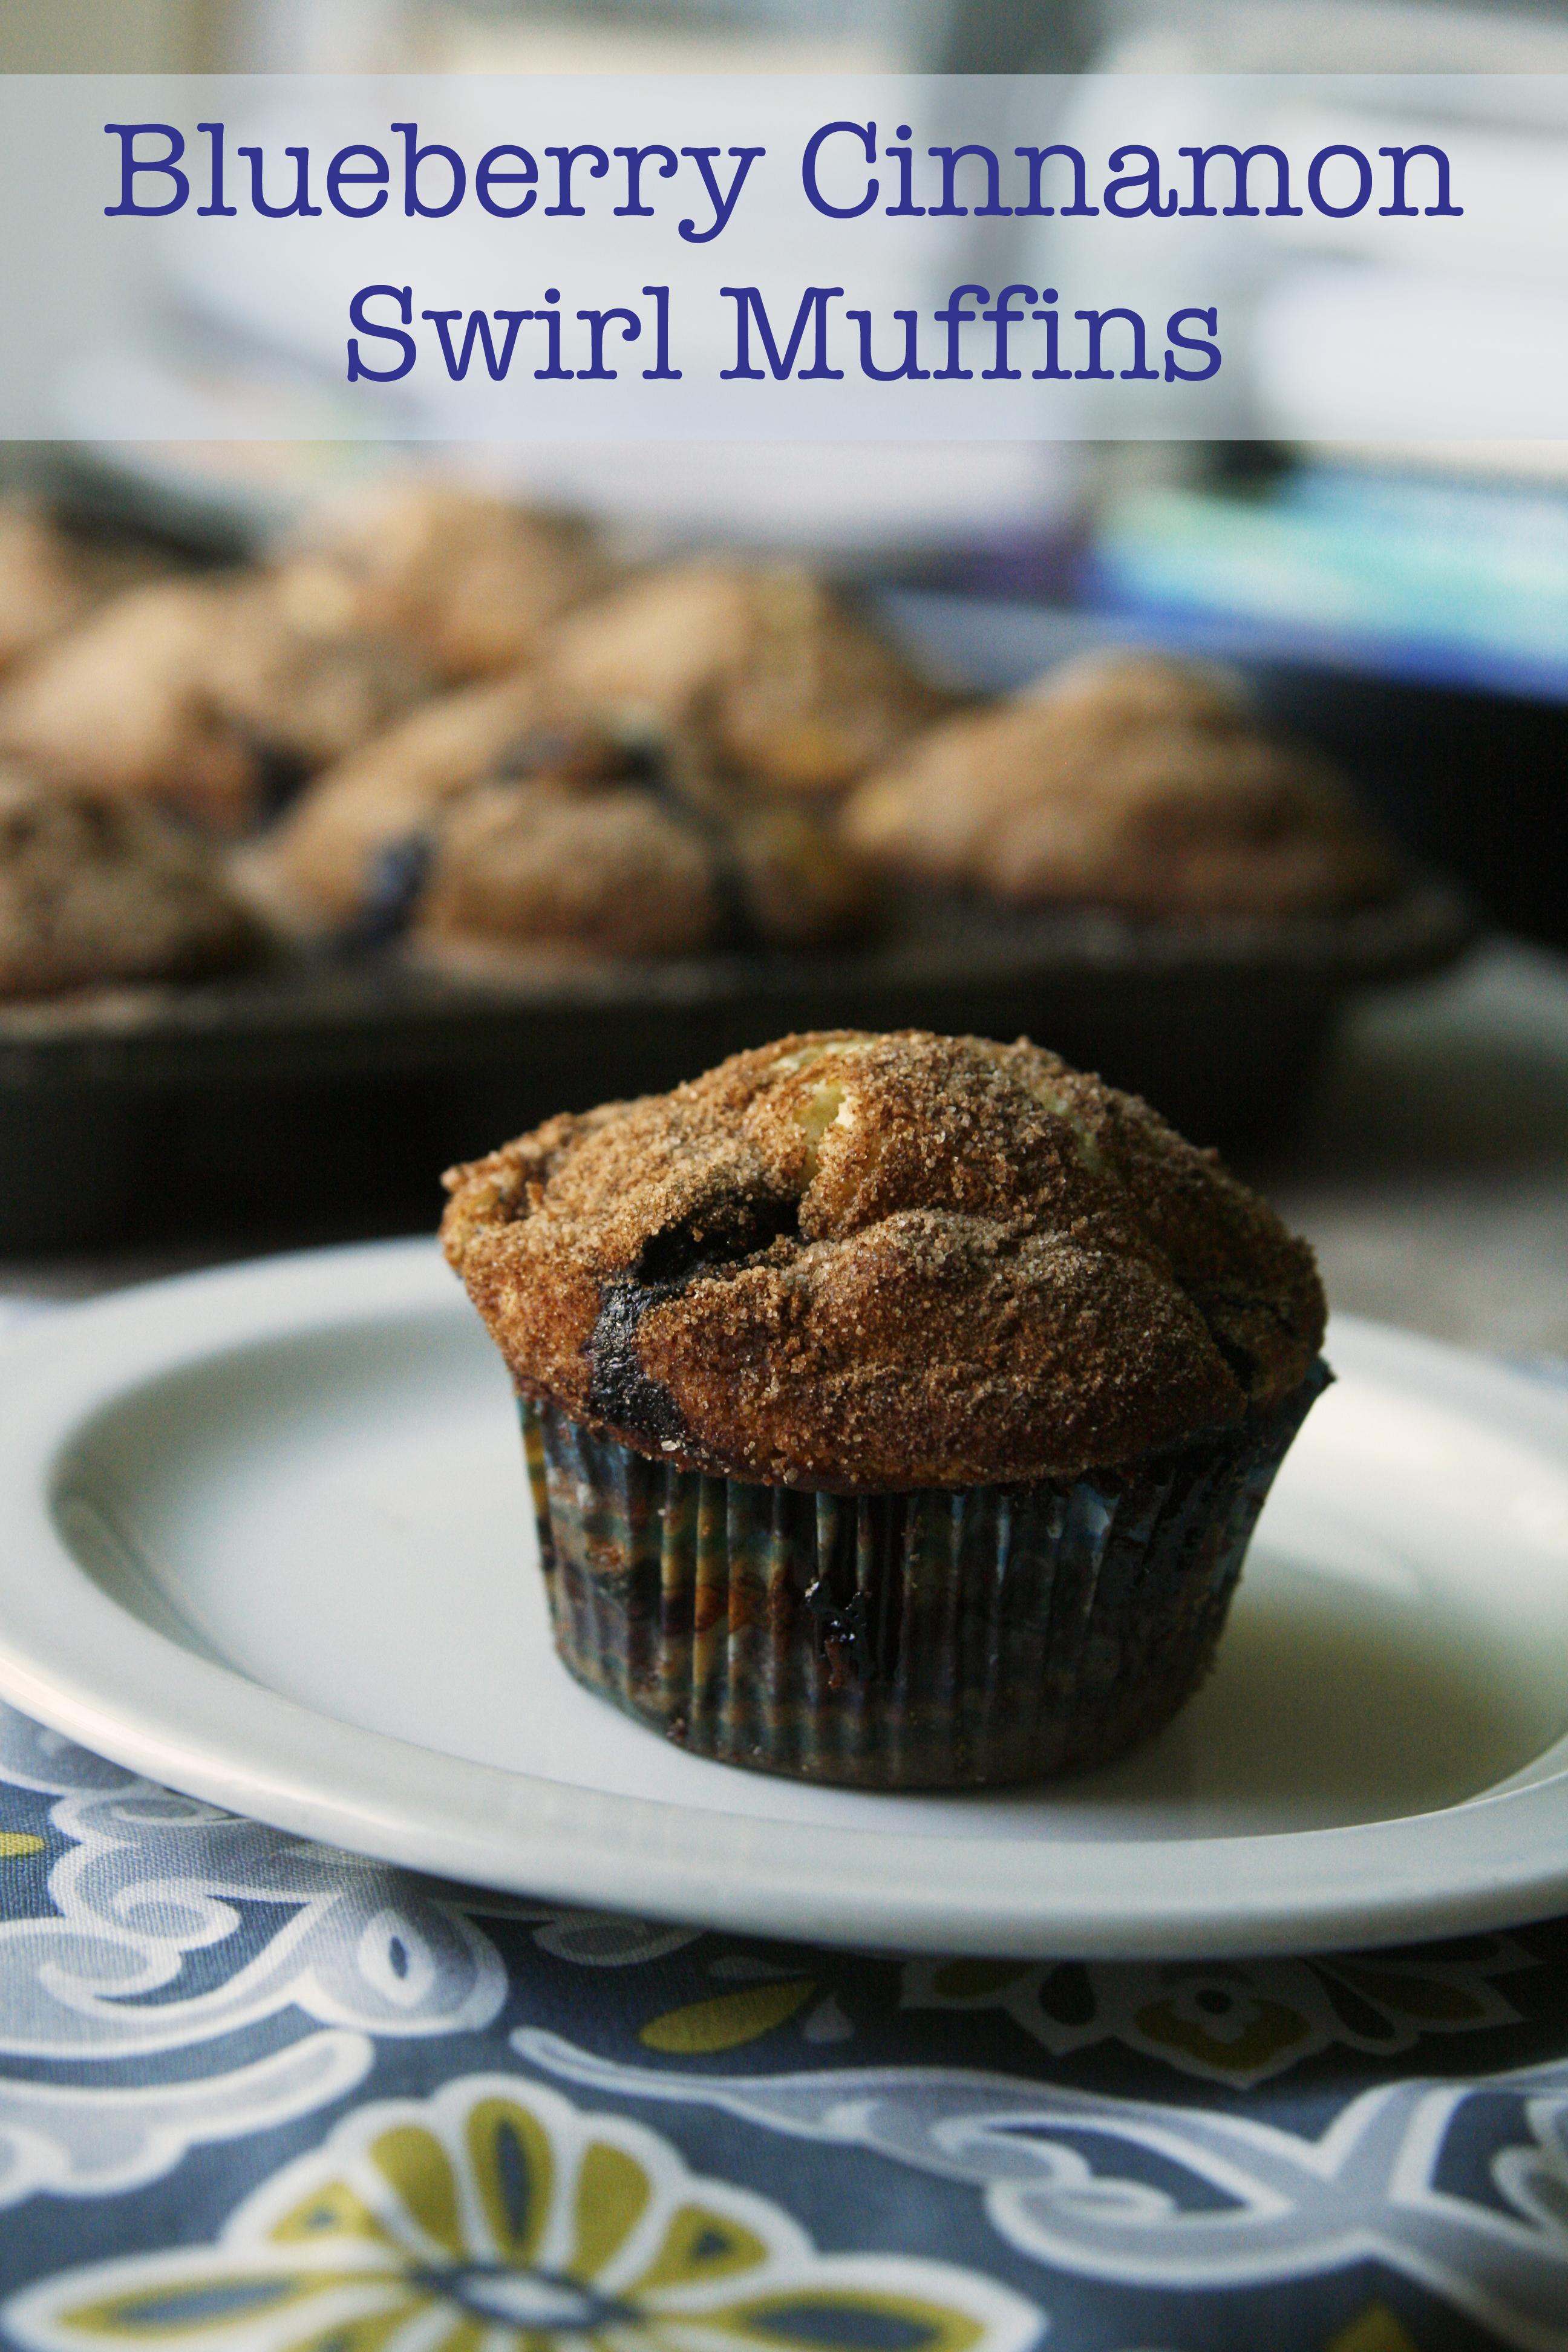 blueberry cinnamon swirl muffins